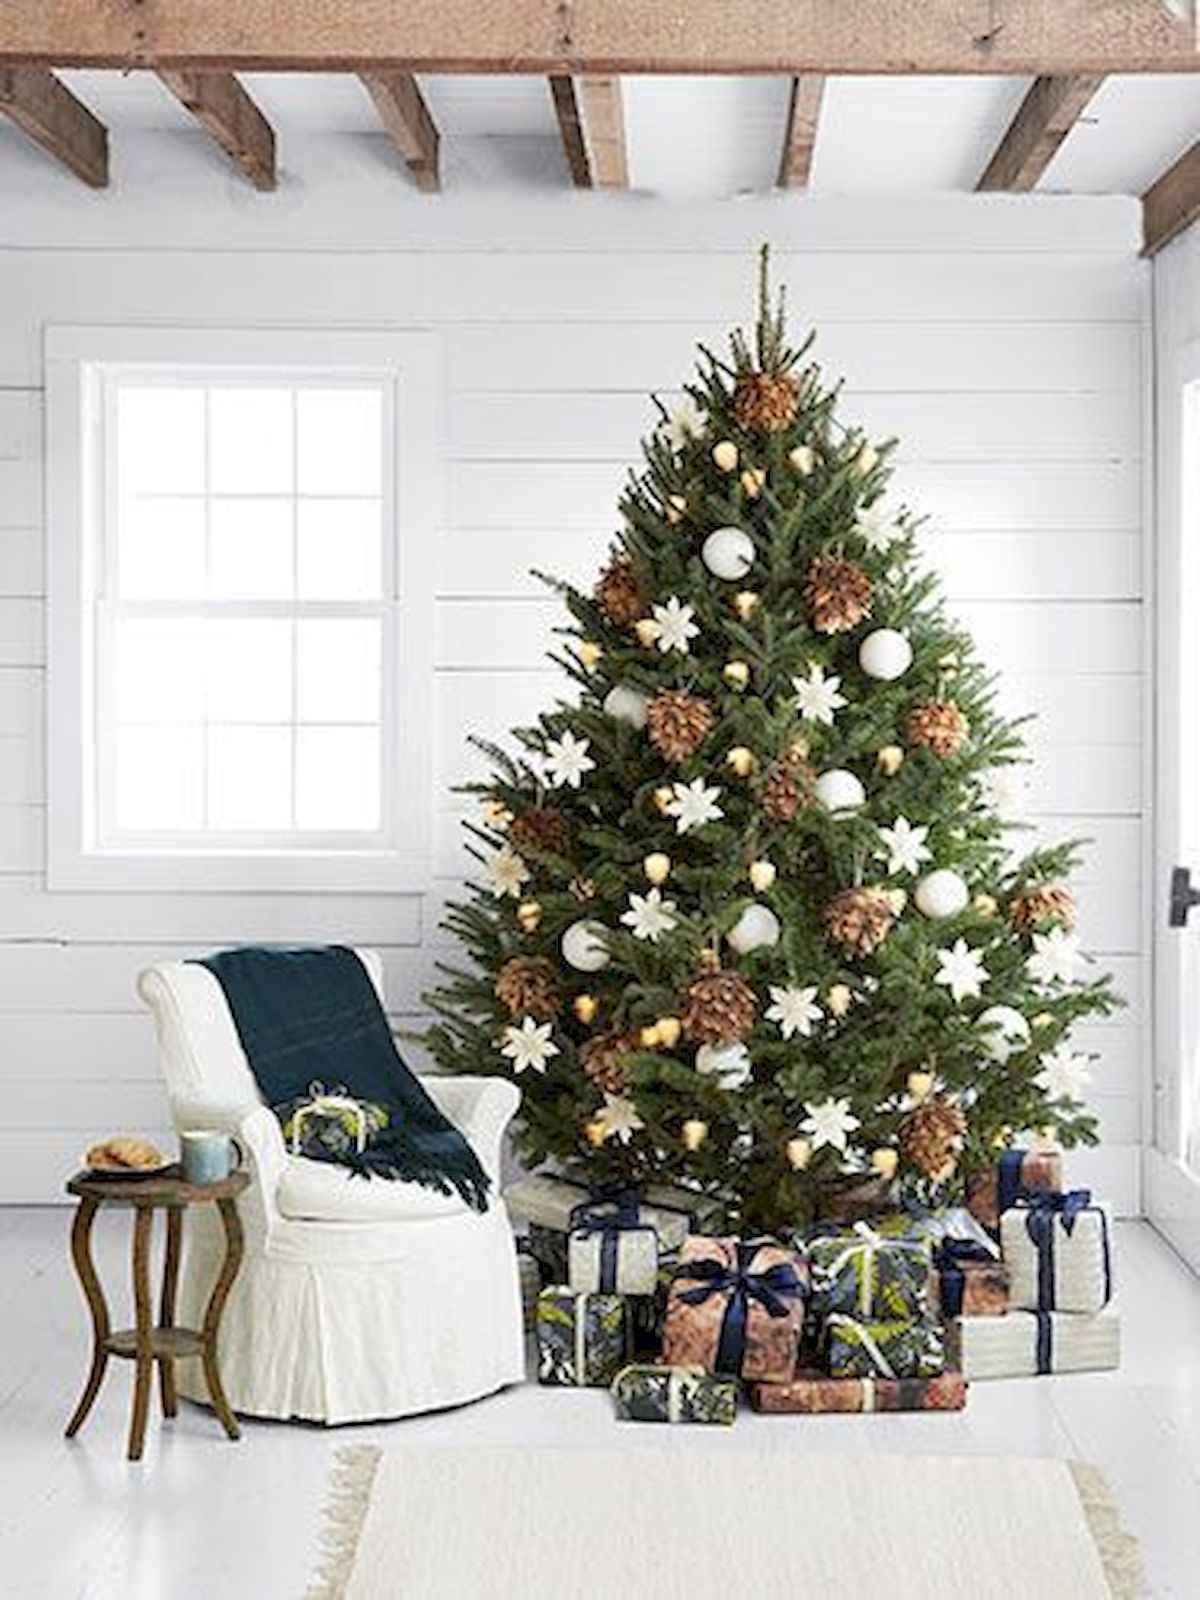 40 elegant christmas tree decorations ideas (1)